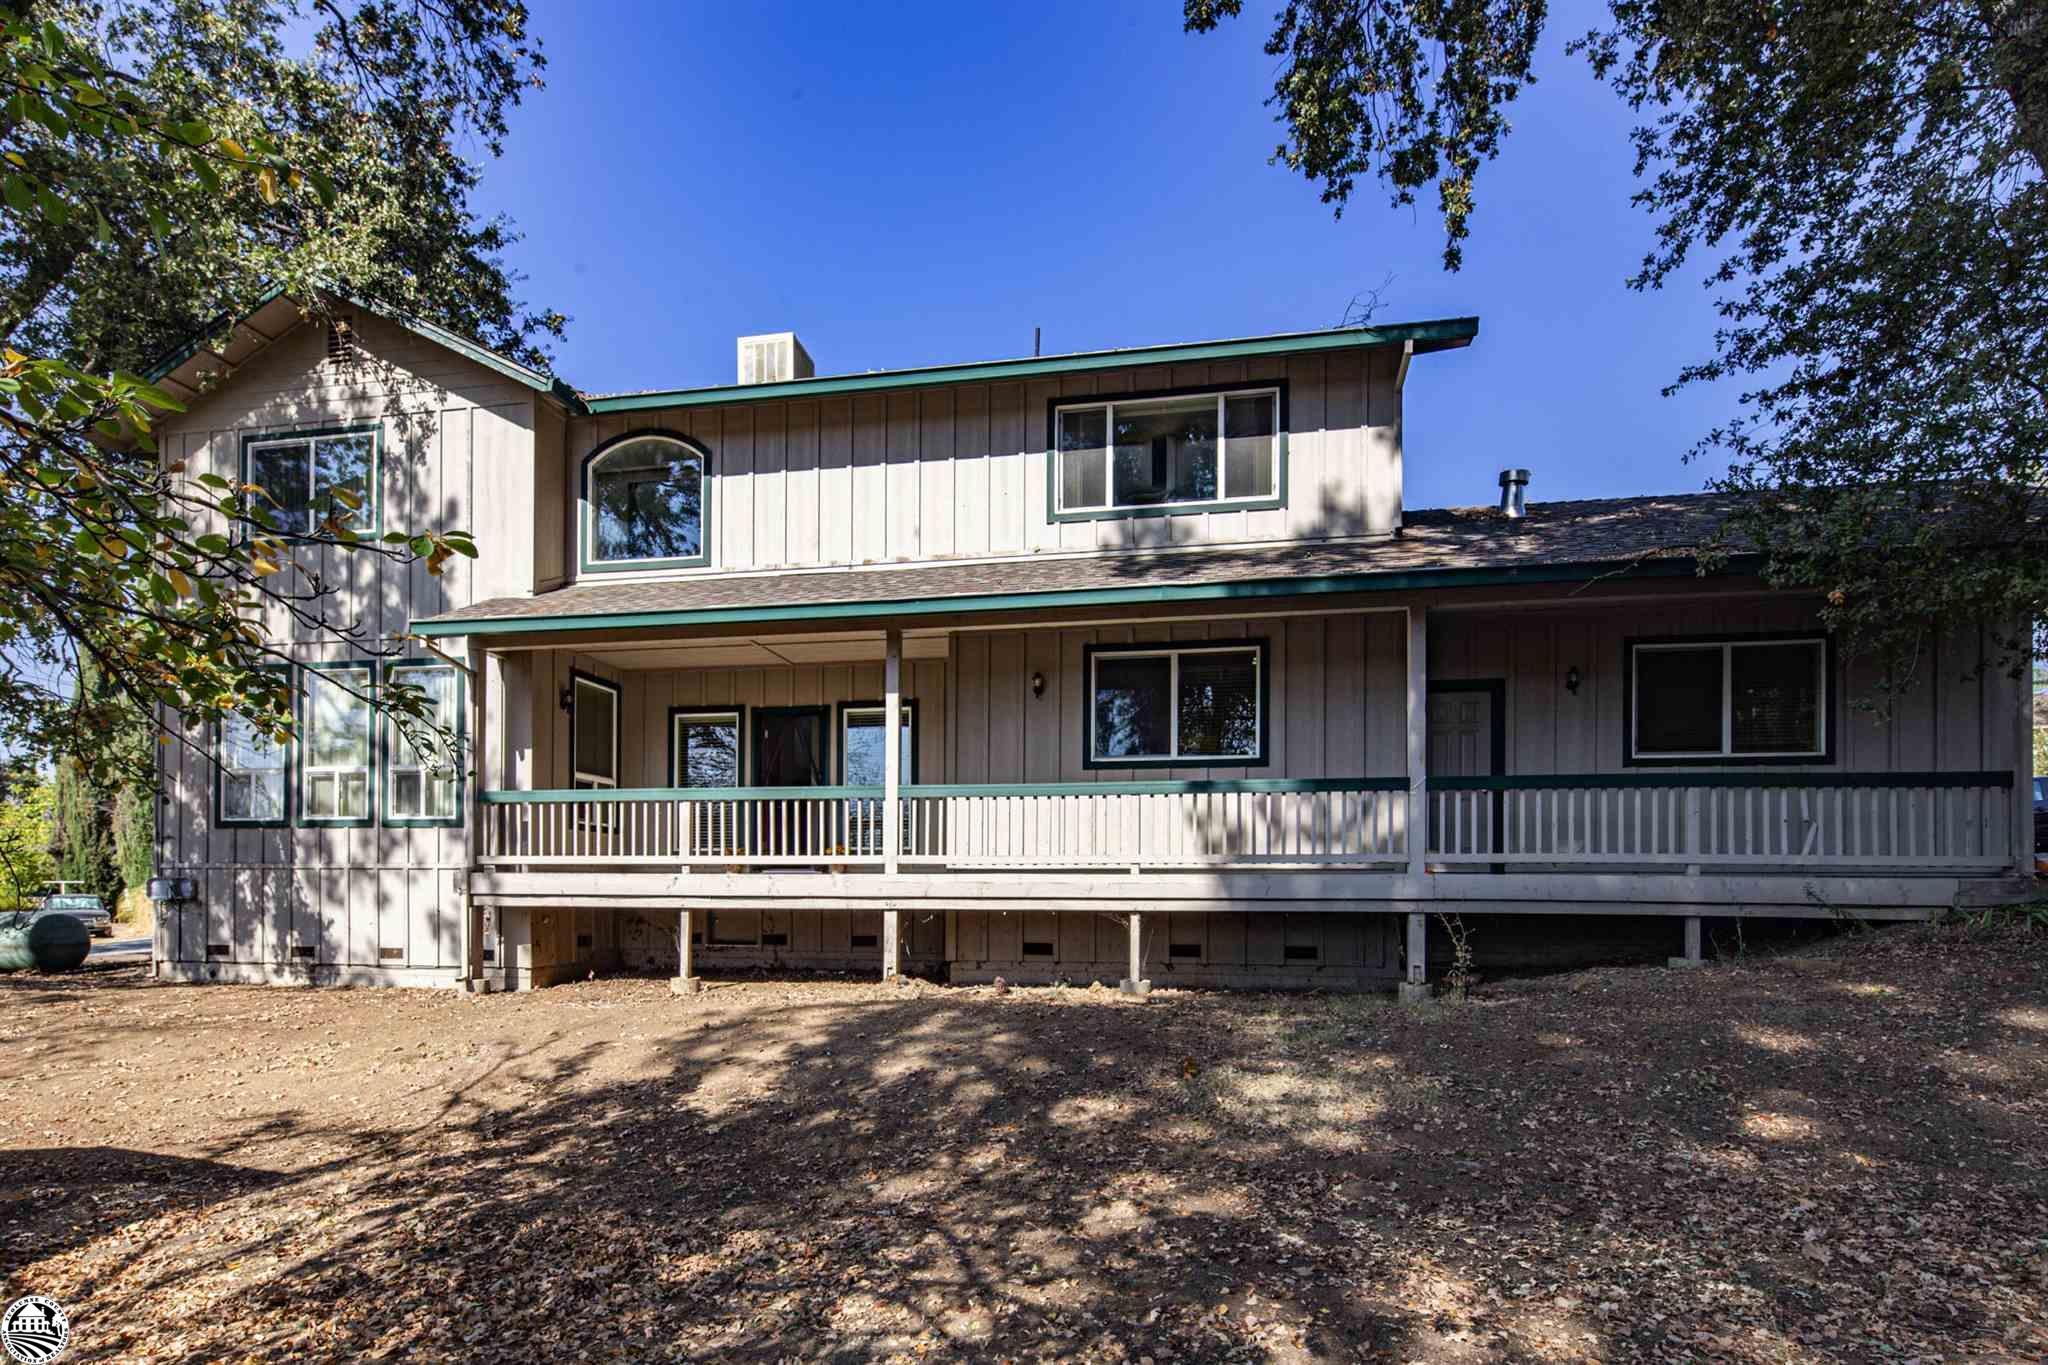 18822 Cedar St, Tuolumne, CA 95379